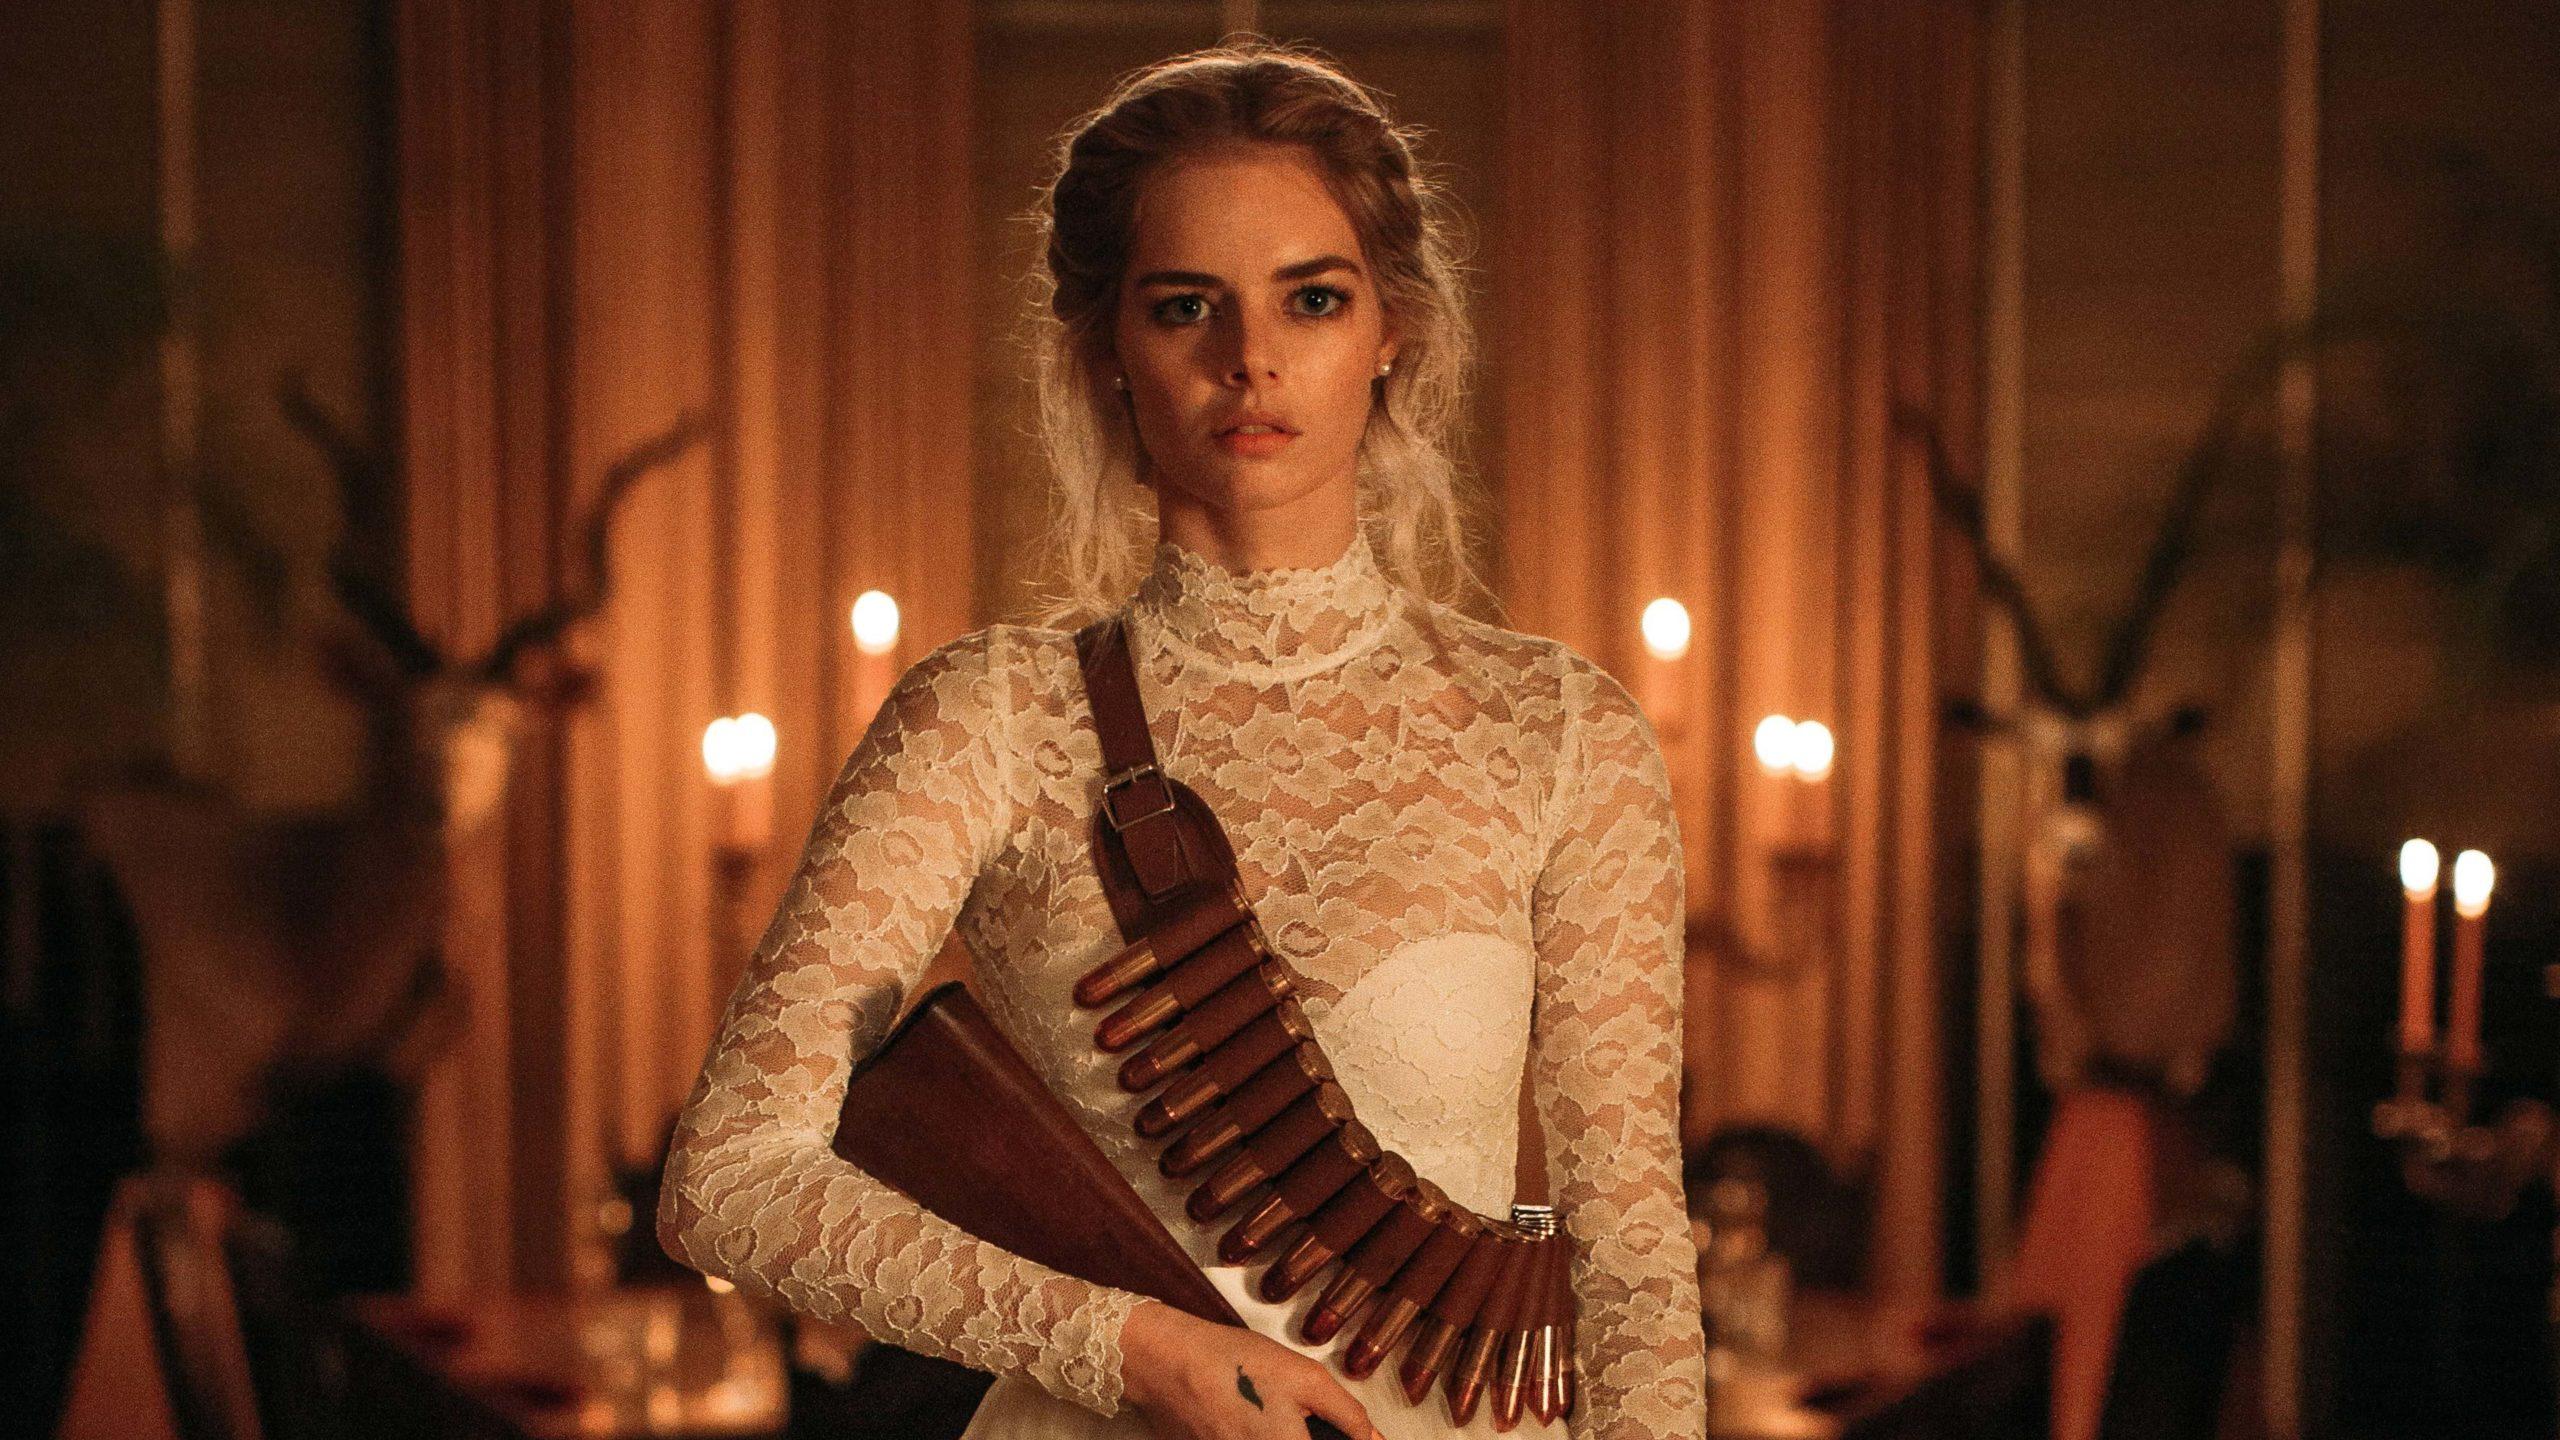 Samara Weaving Elizabeth Patterson Bonaparte liz fil'm hafızası